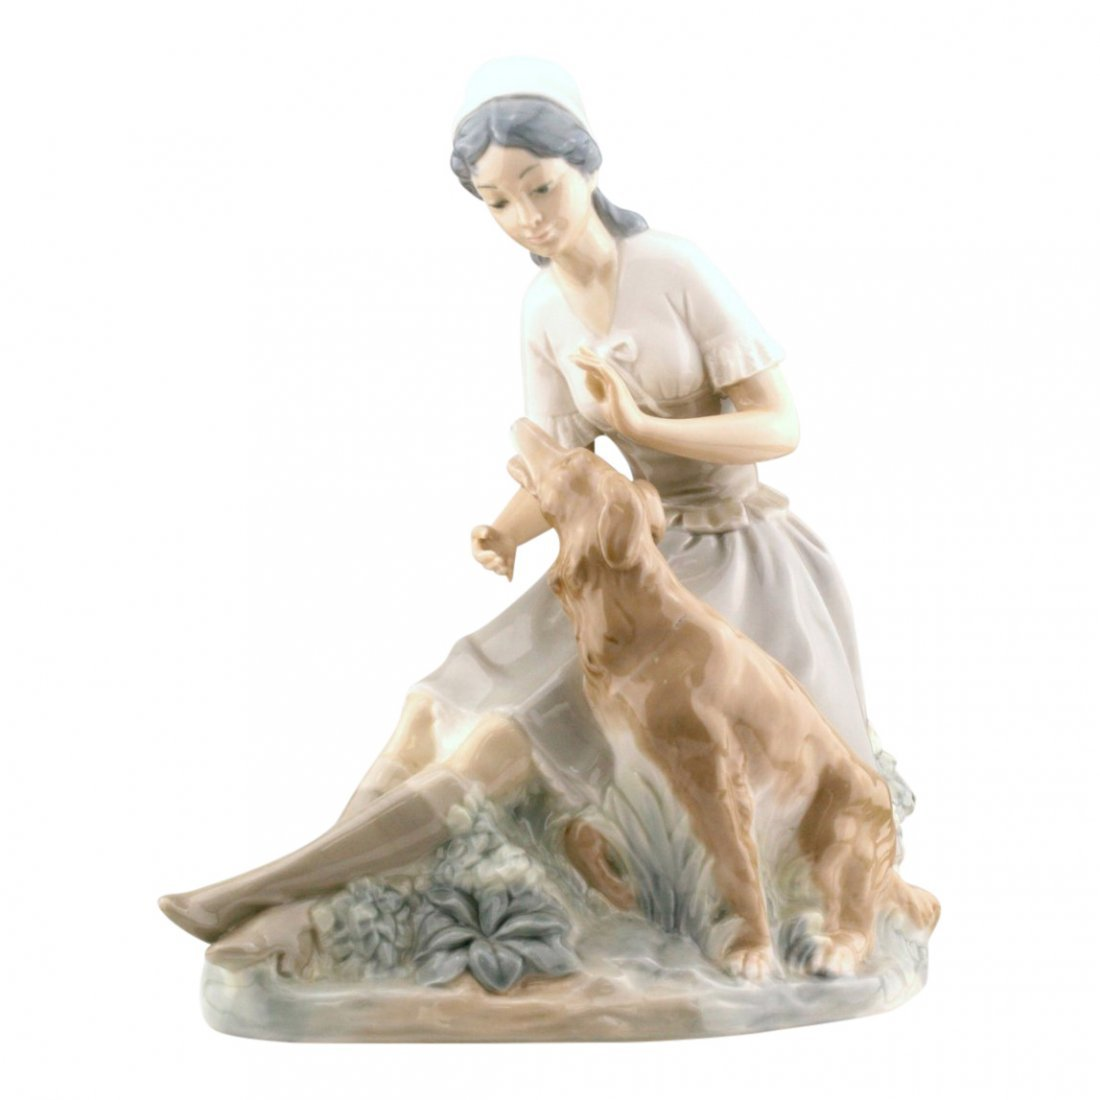 Lladro Nao Woman With Dog Figurine